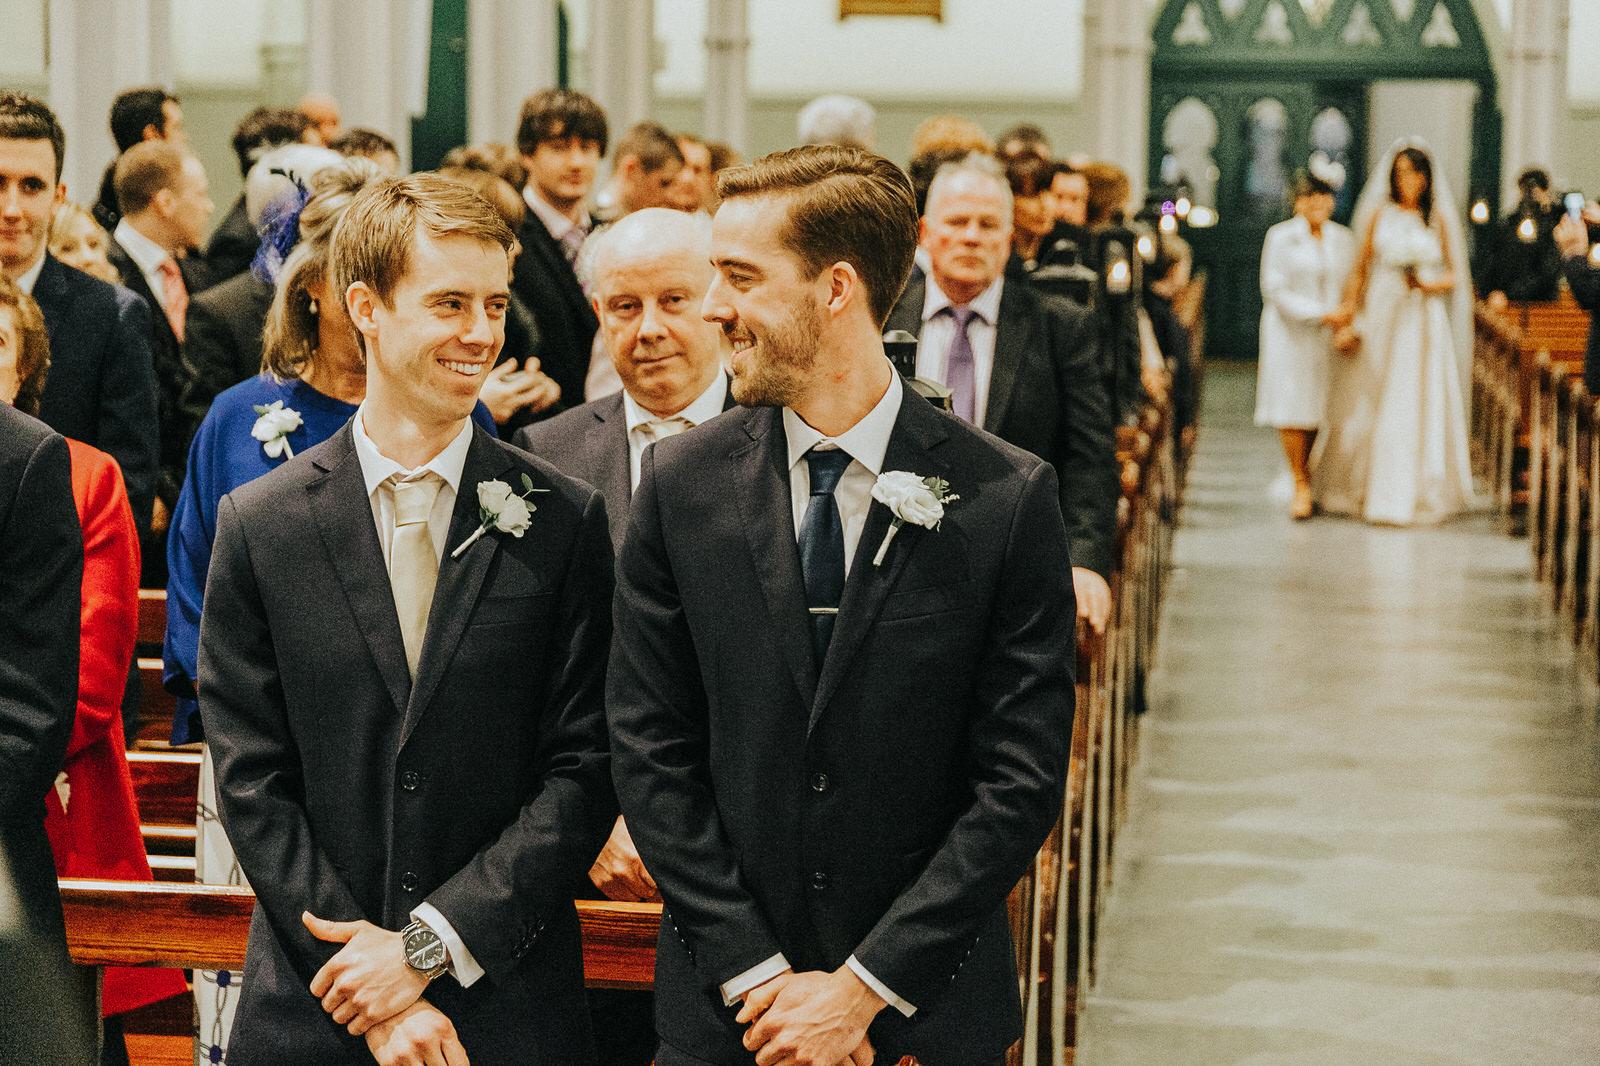 Roger_Kenny_wedding_photographer_429.jpg